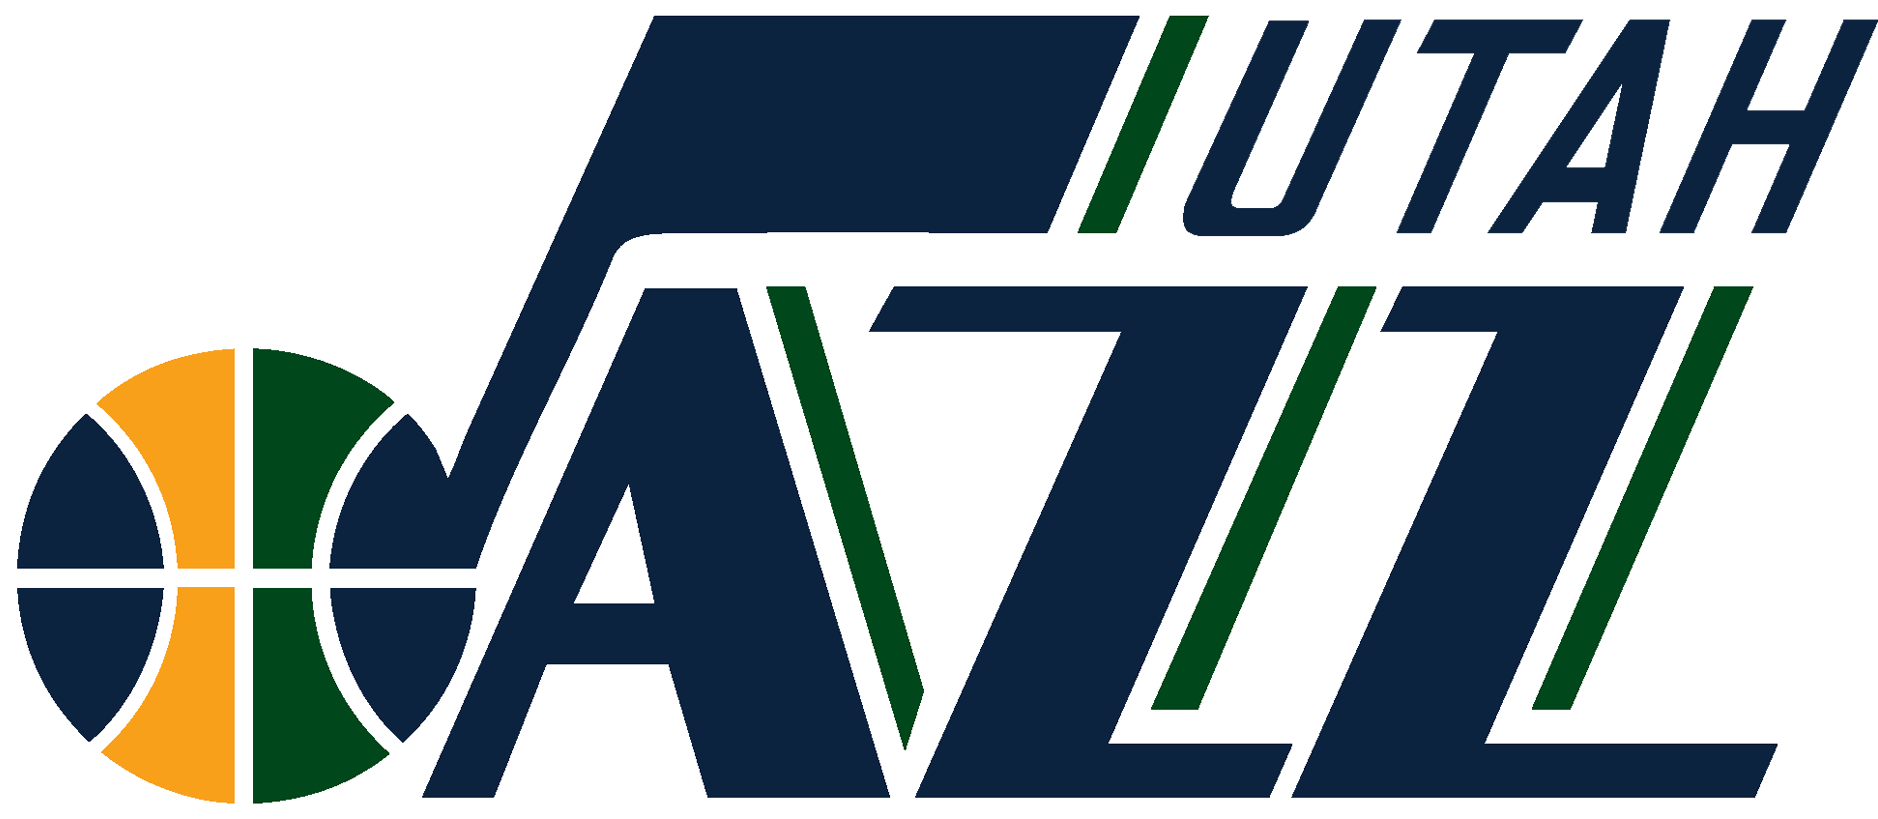 Utah Jazz Logo Utah Jazz Symbol Meaning History And Clipart Full Size Clipart 2709188 Pinclipart